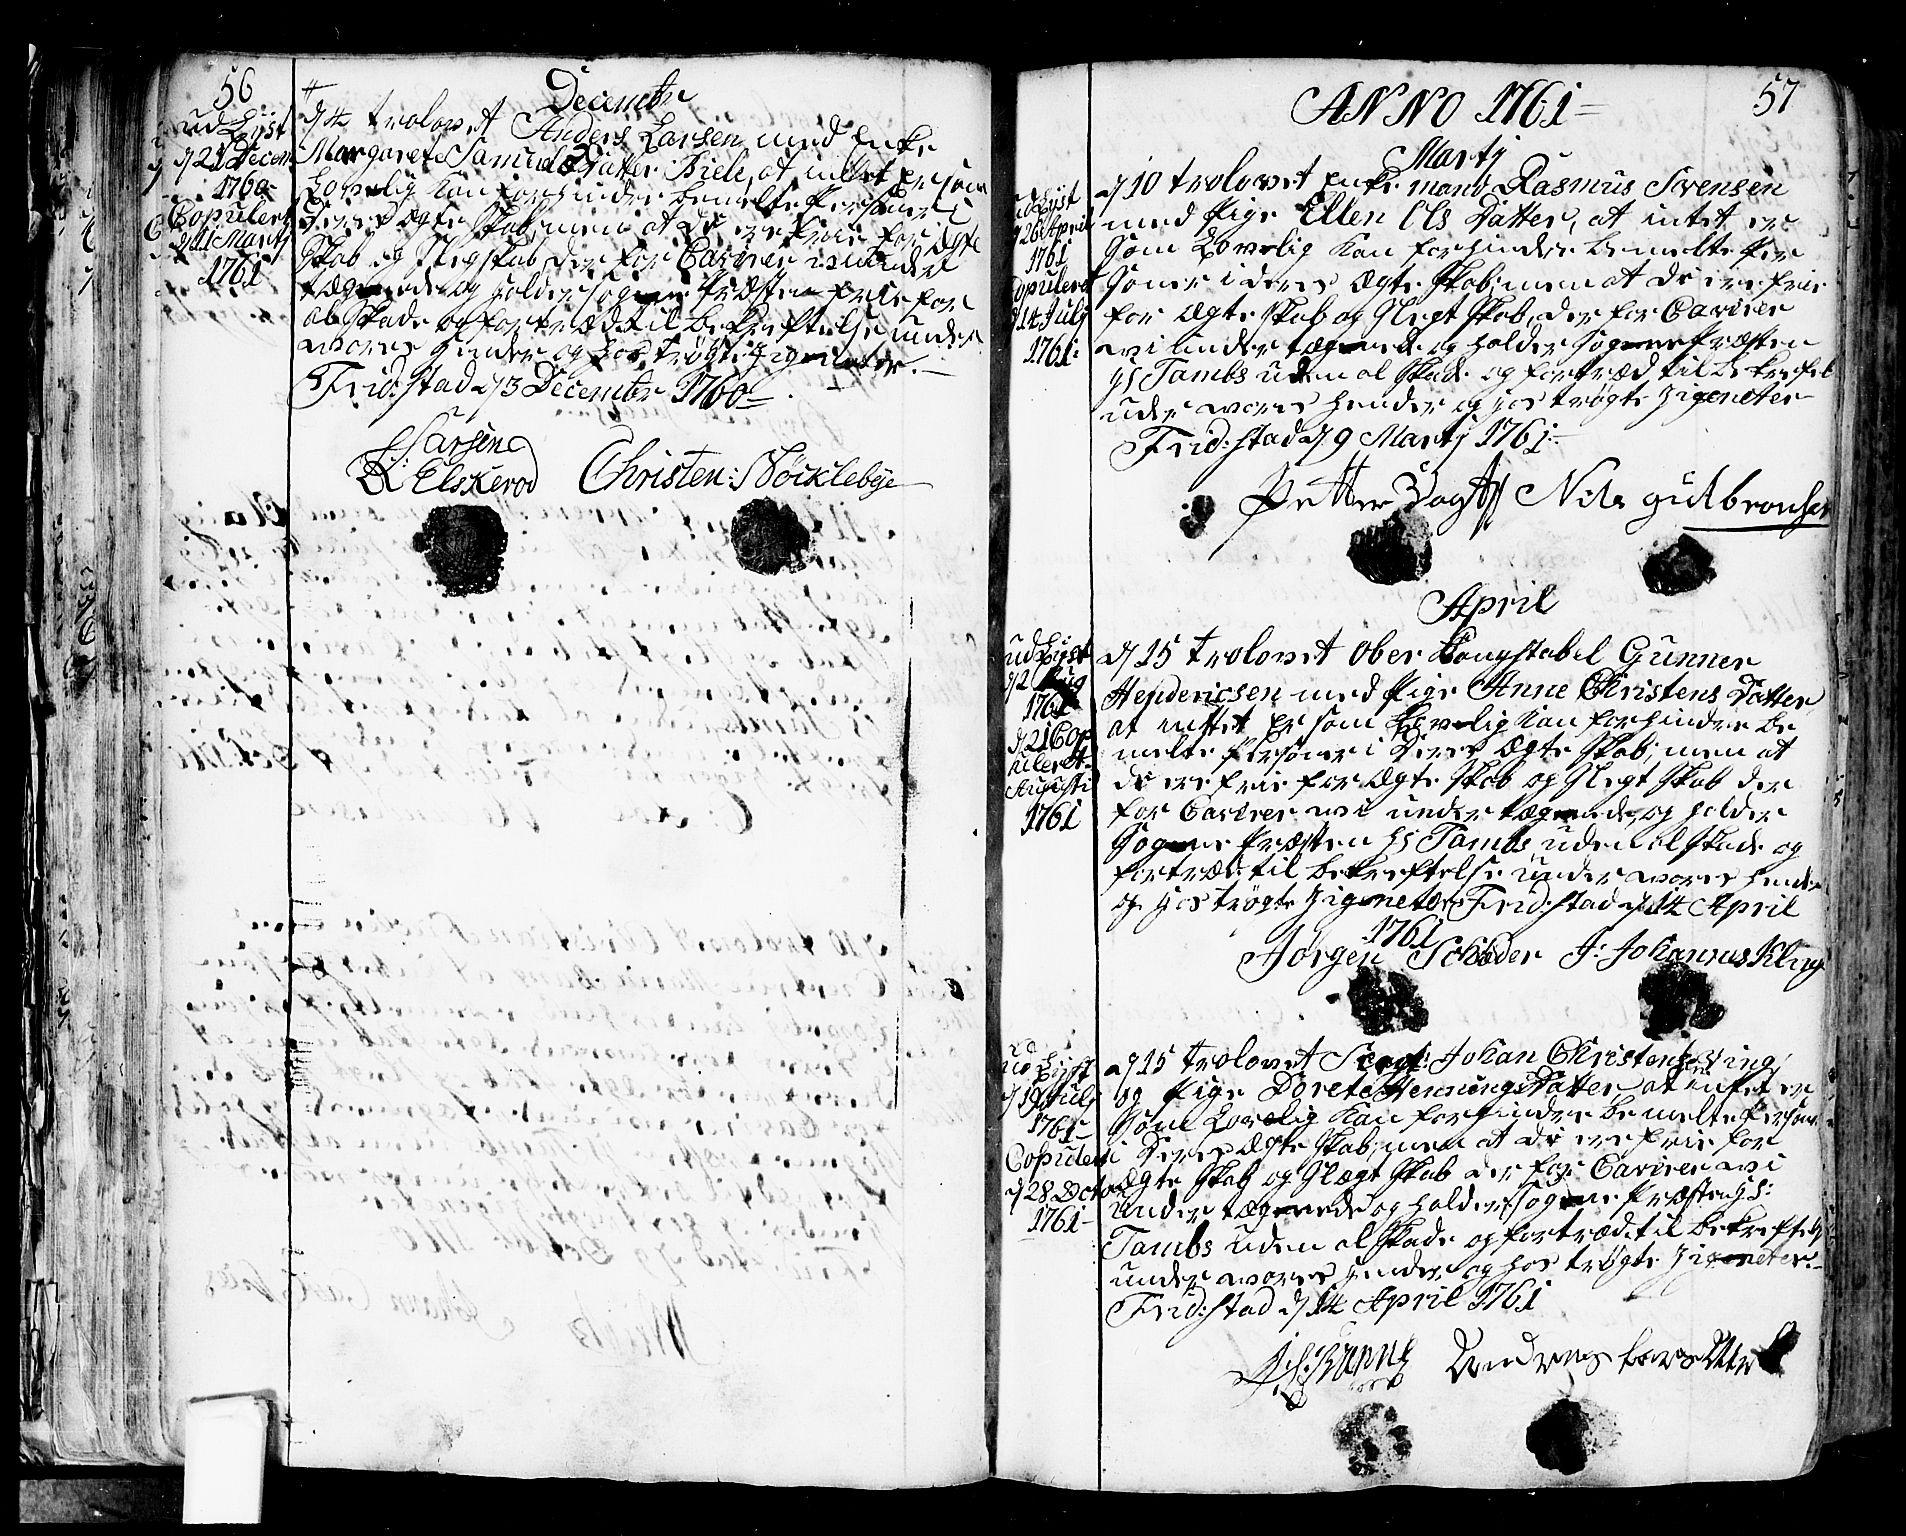 SAO, Fredrikstad prestekontor Kirkebøker, F/Fa/L0002: Parish register (official) no. 2, 1750-1804, p. 56-57